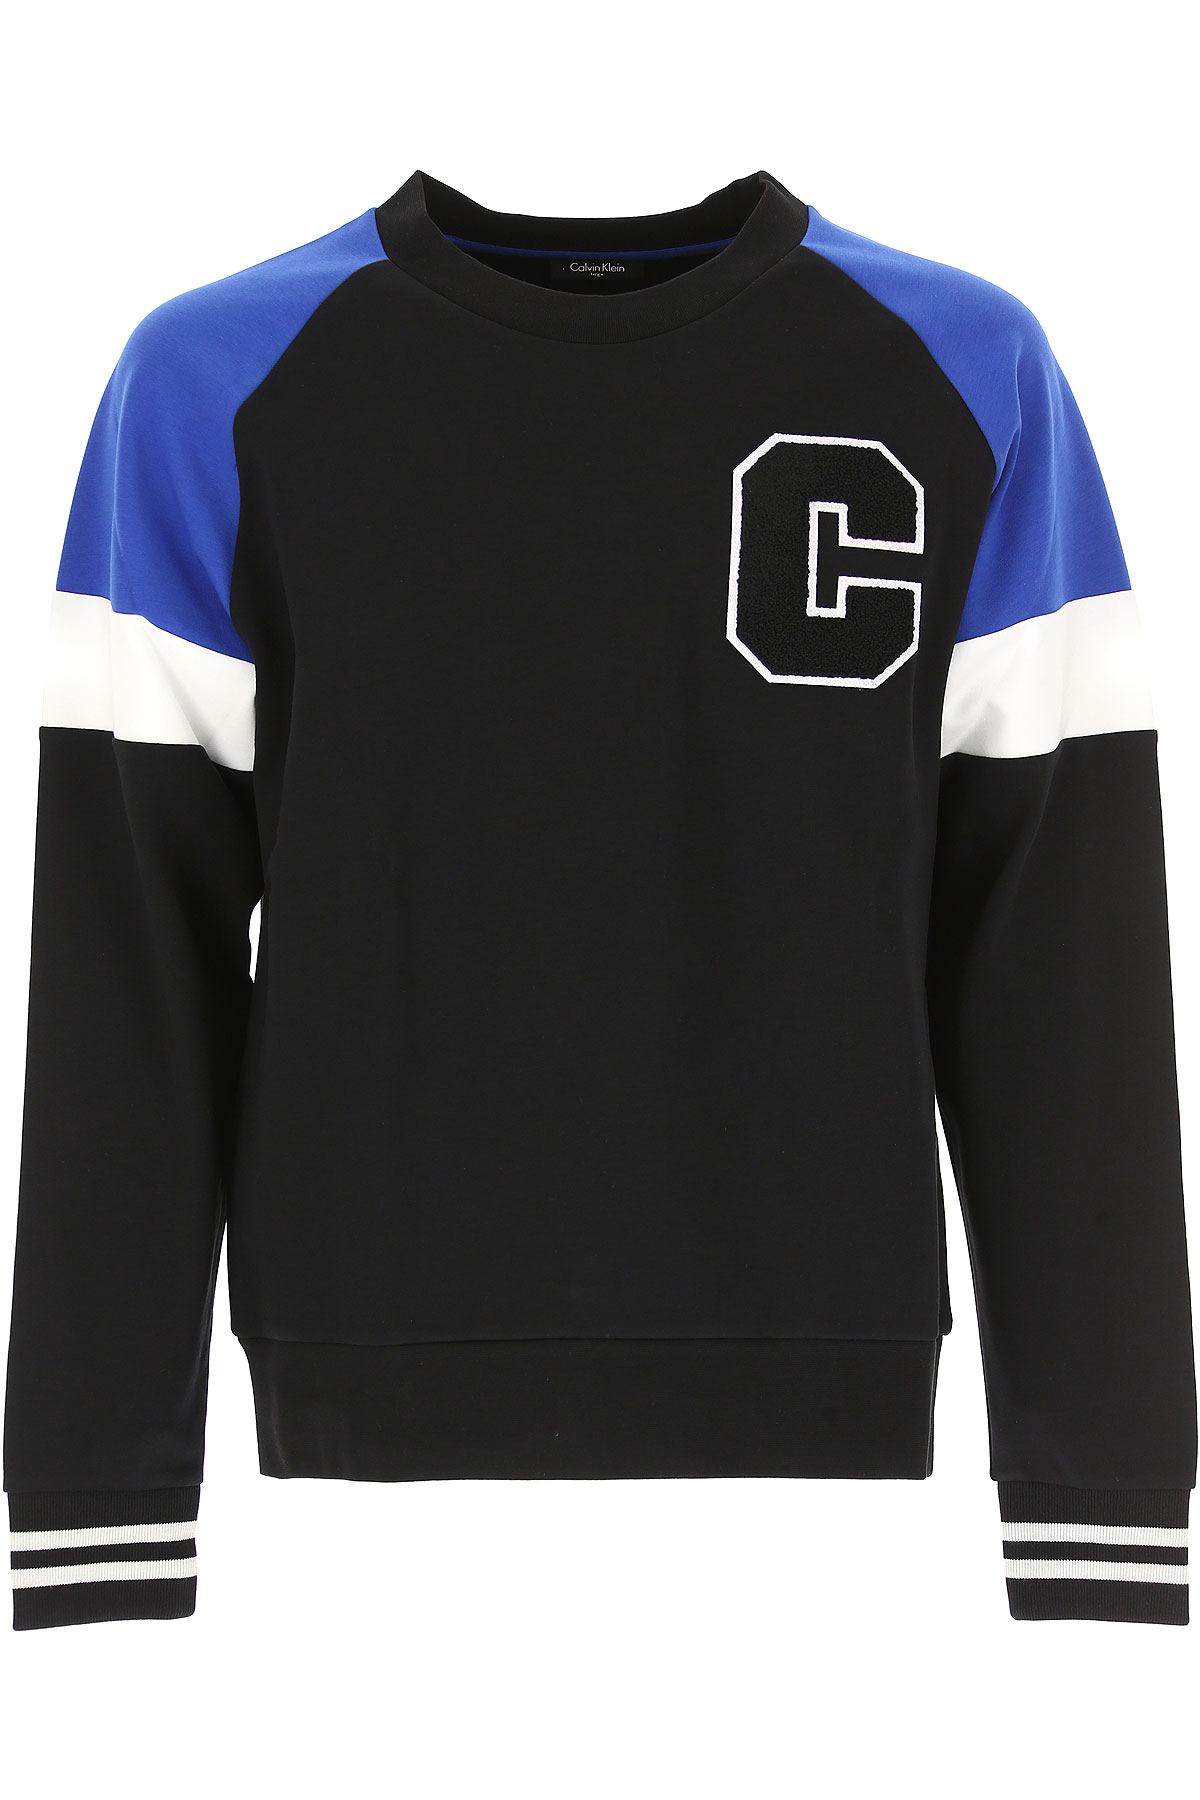 Calvin Klein Sweatshirt for Men, Black, Cotton, 2017, L M S XL USA-467663